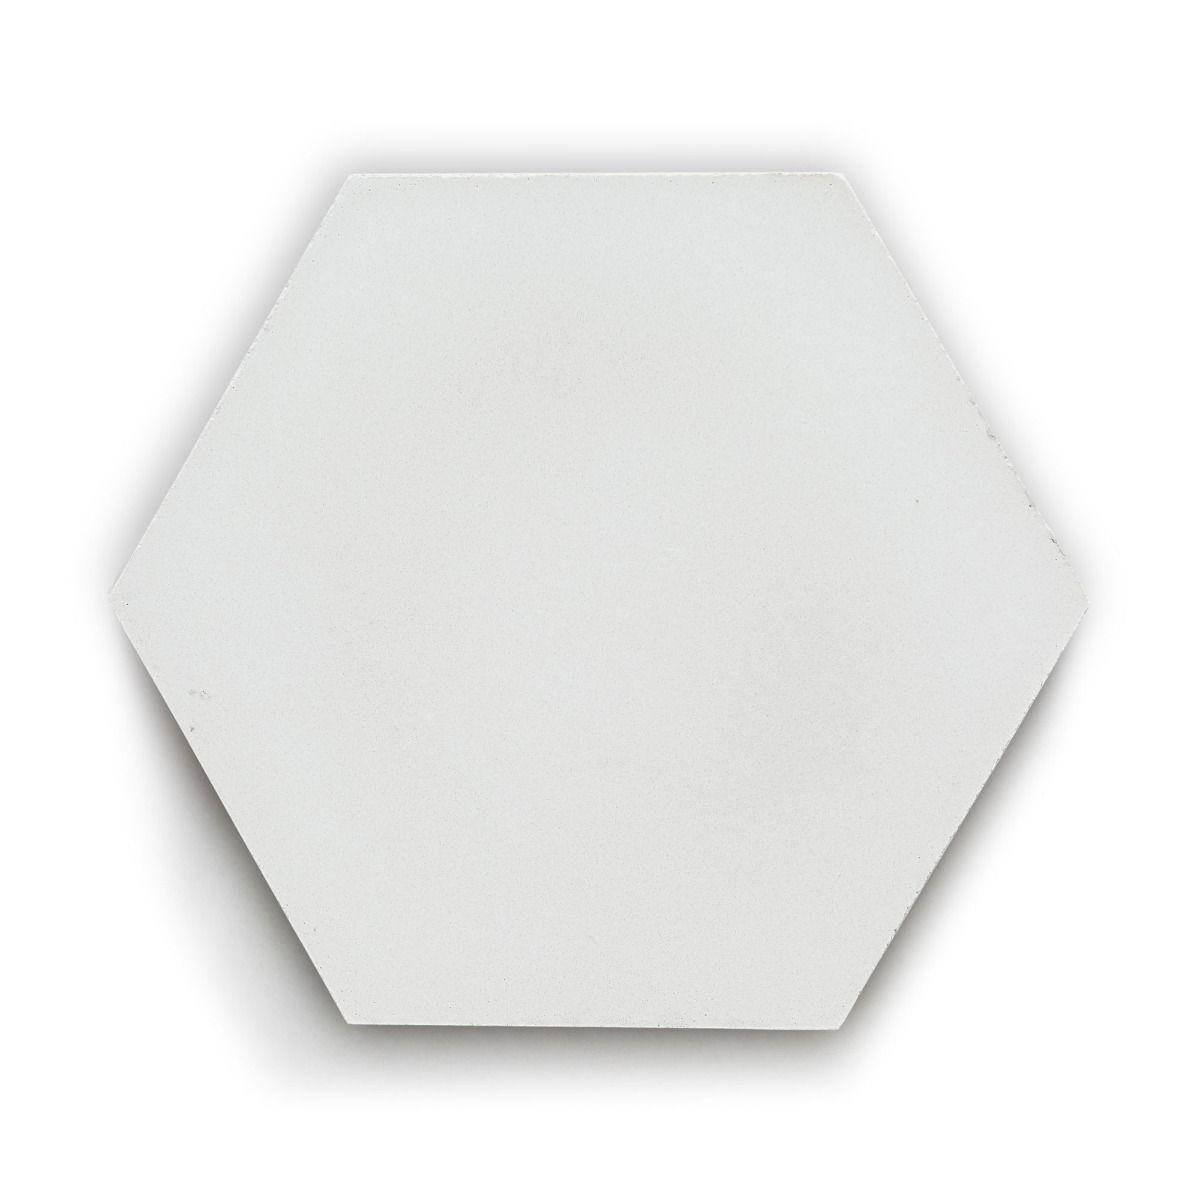 Bert & May Brighton Stone Hexagon  20cm x 23cm